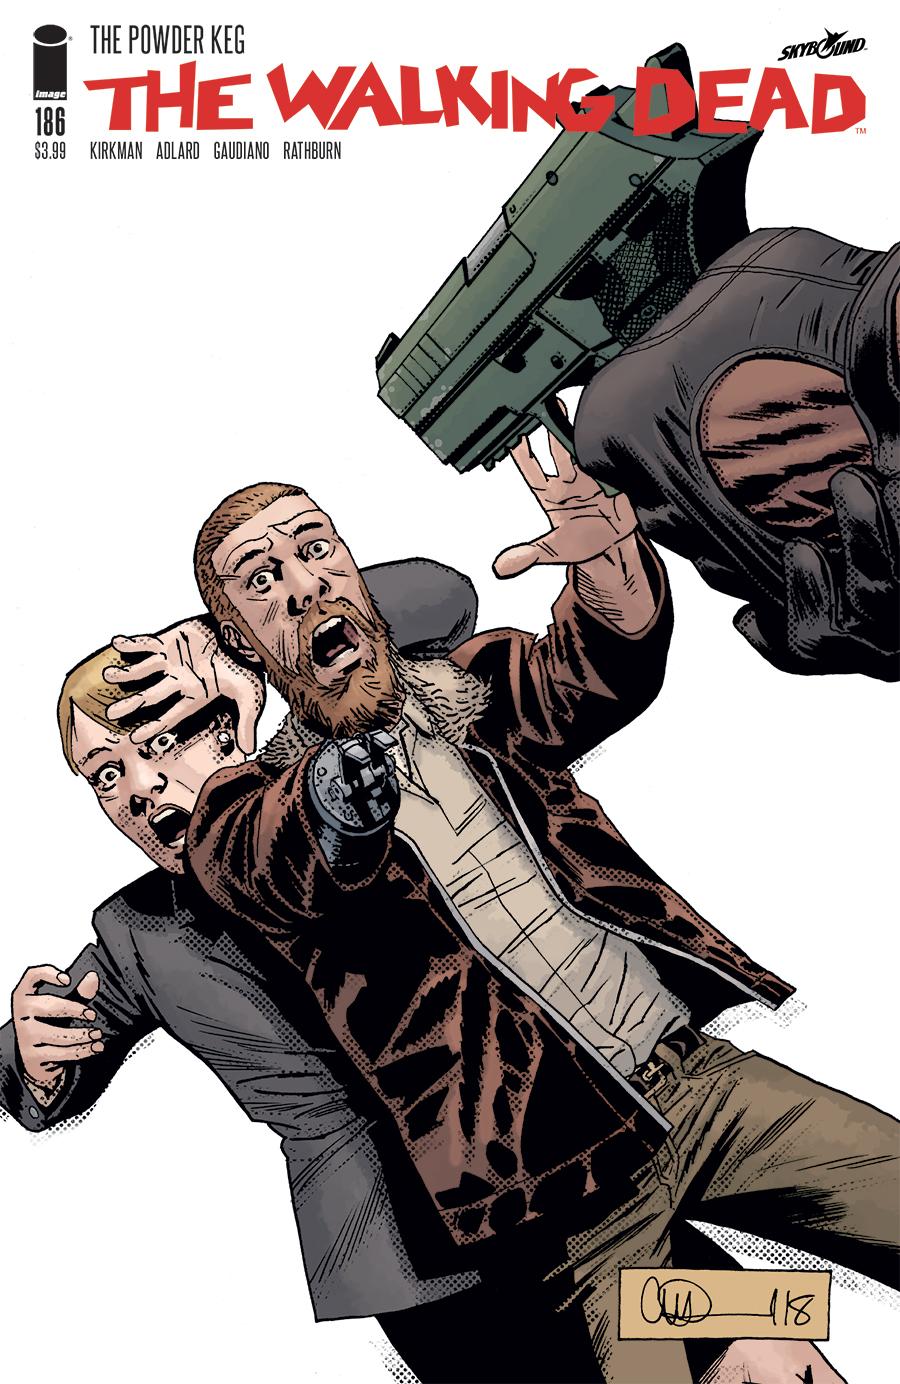 The Walking Dead #1-15th Anniversary Big Easy Comics Variant